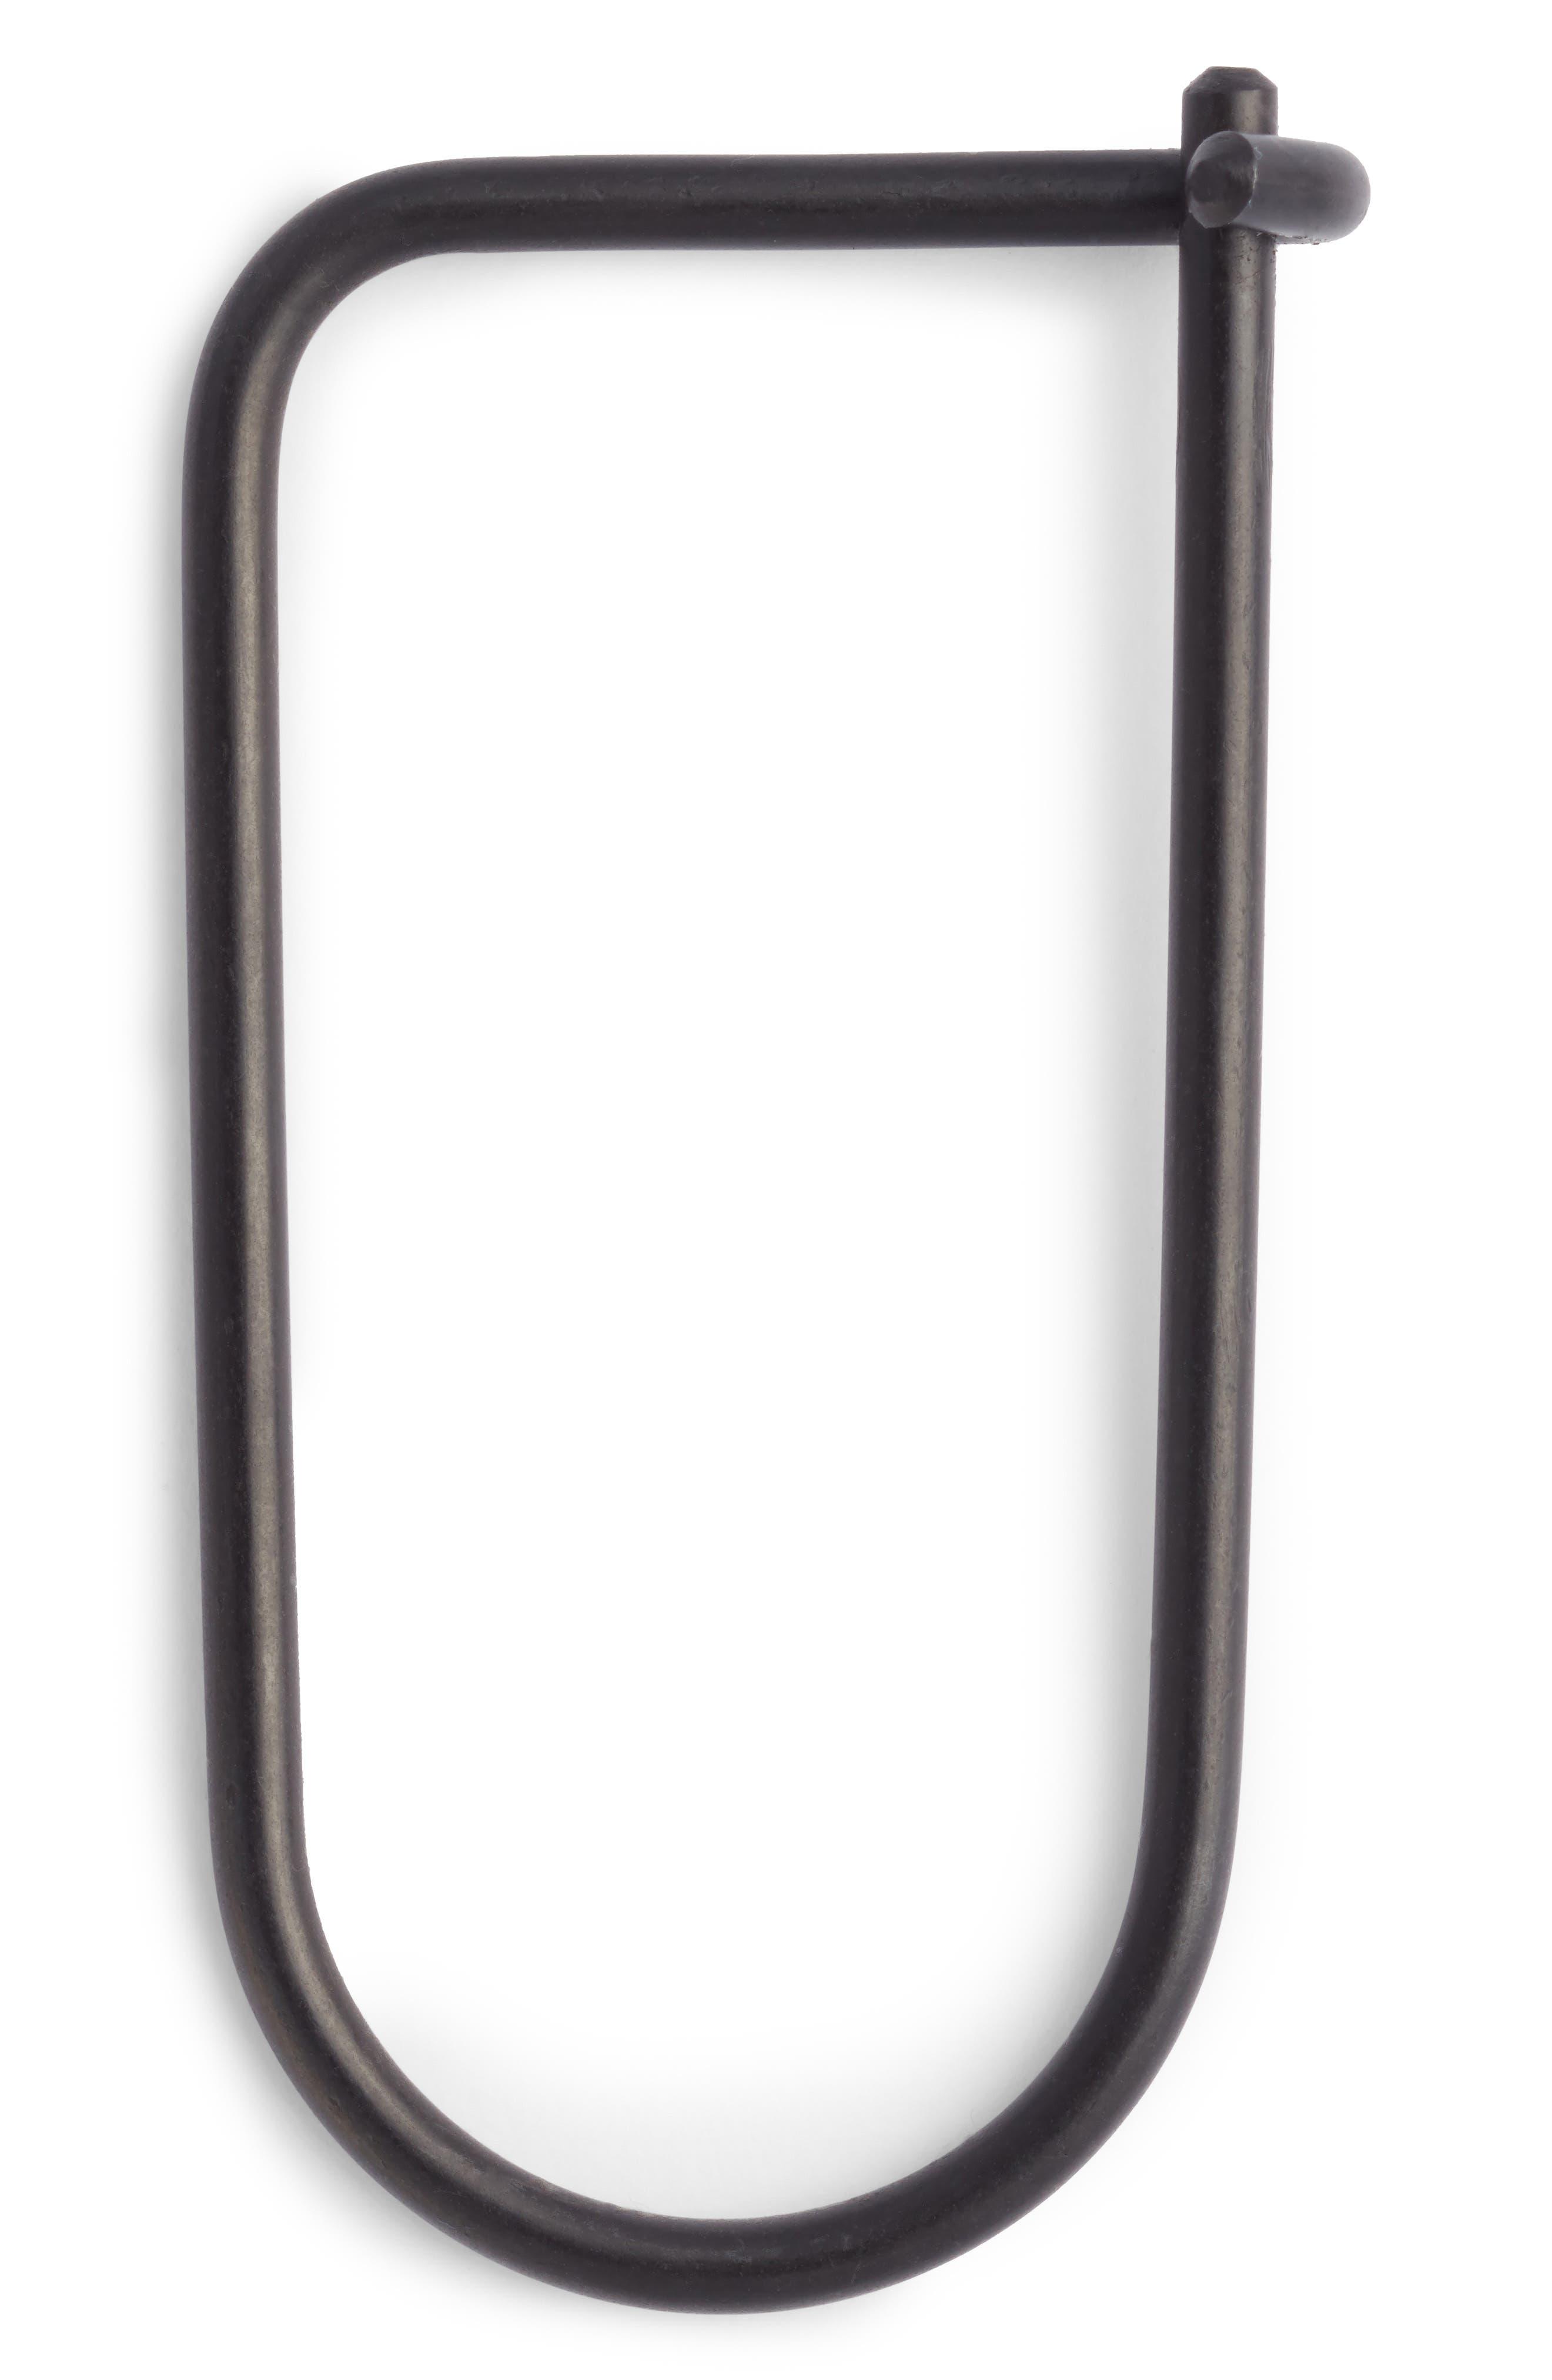 Main Image - Craighill Wilson Carbon Black Steel Key Ring